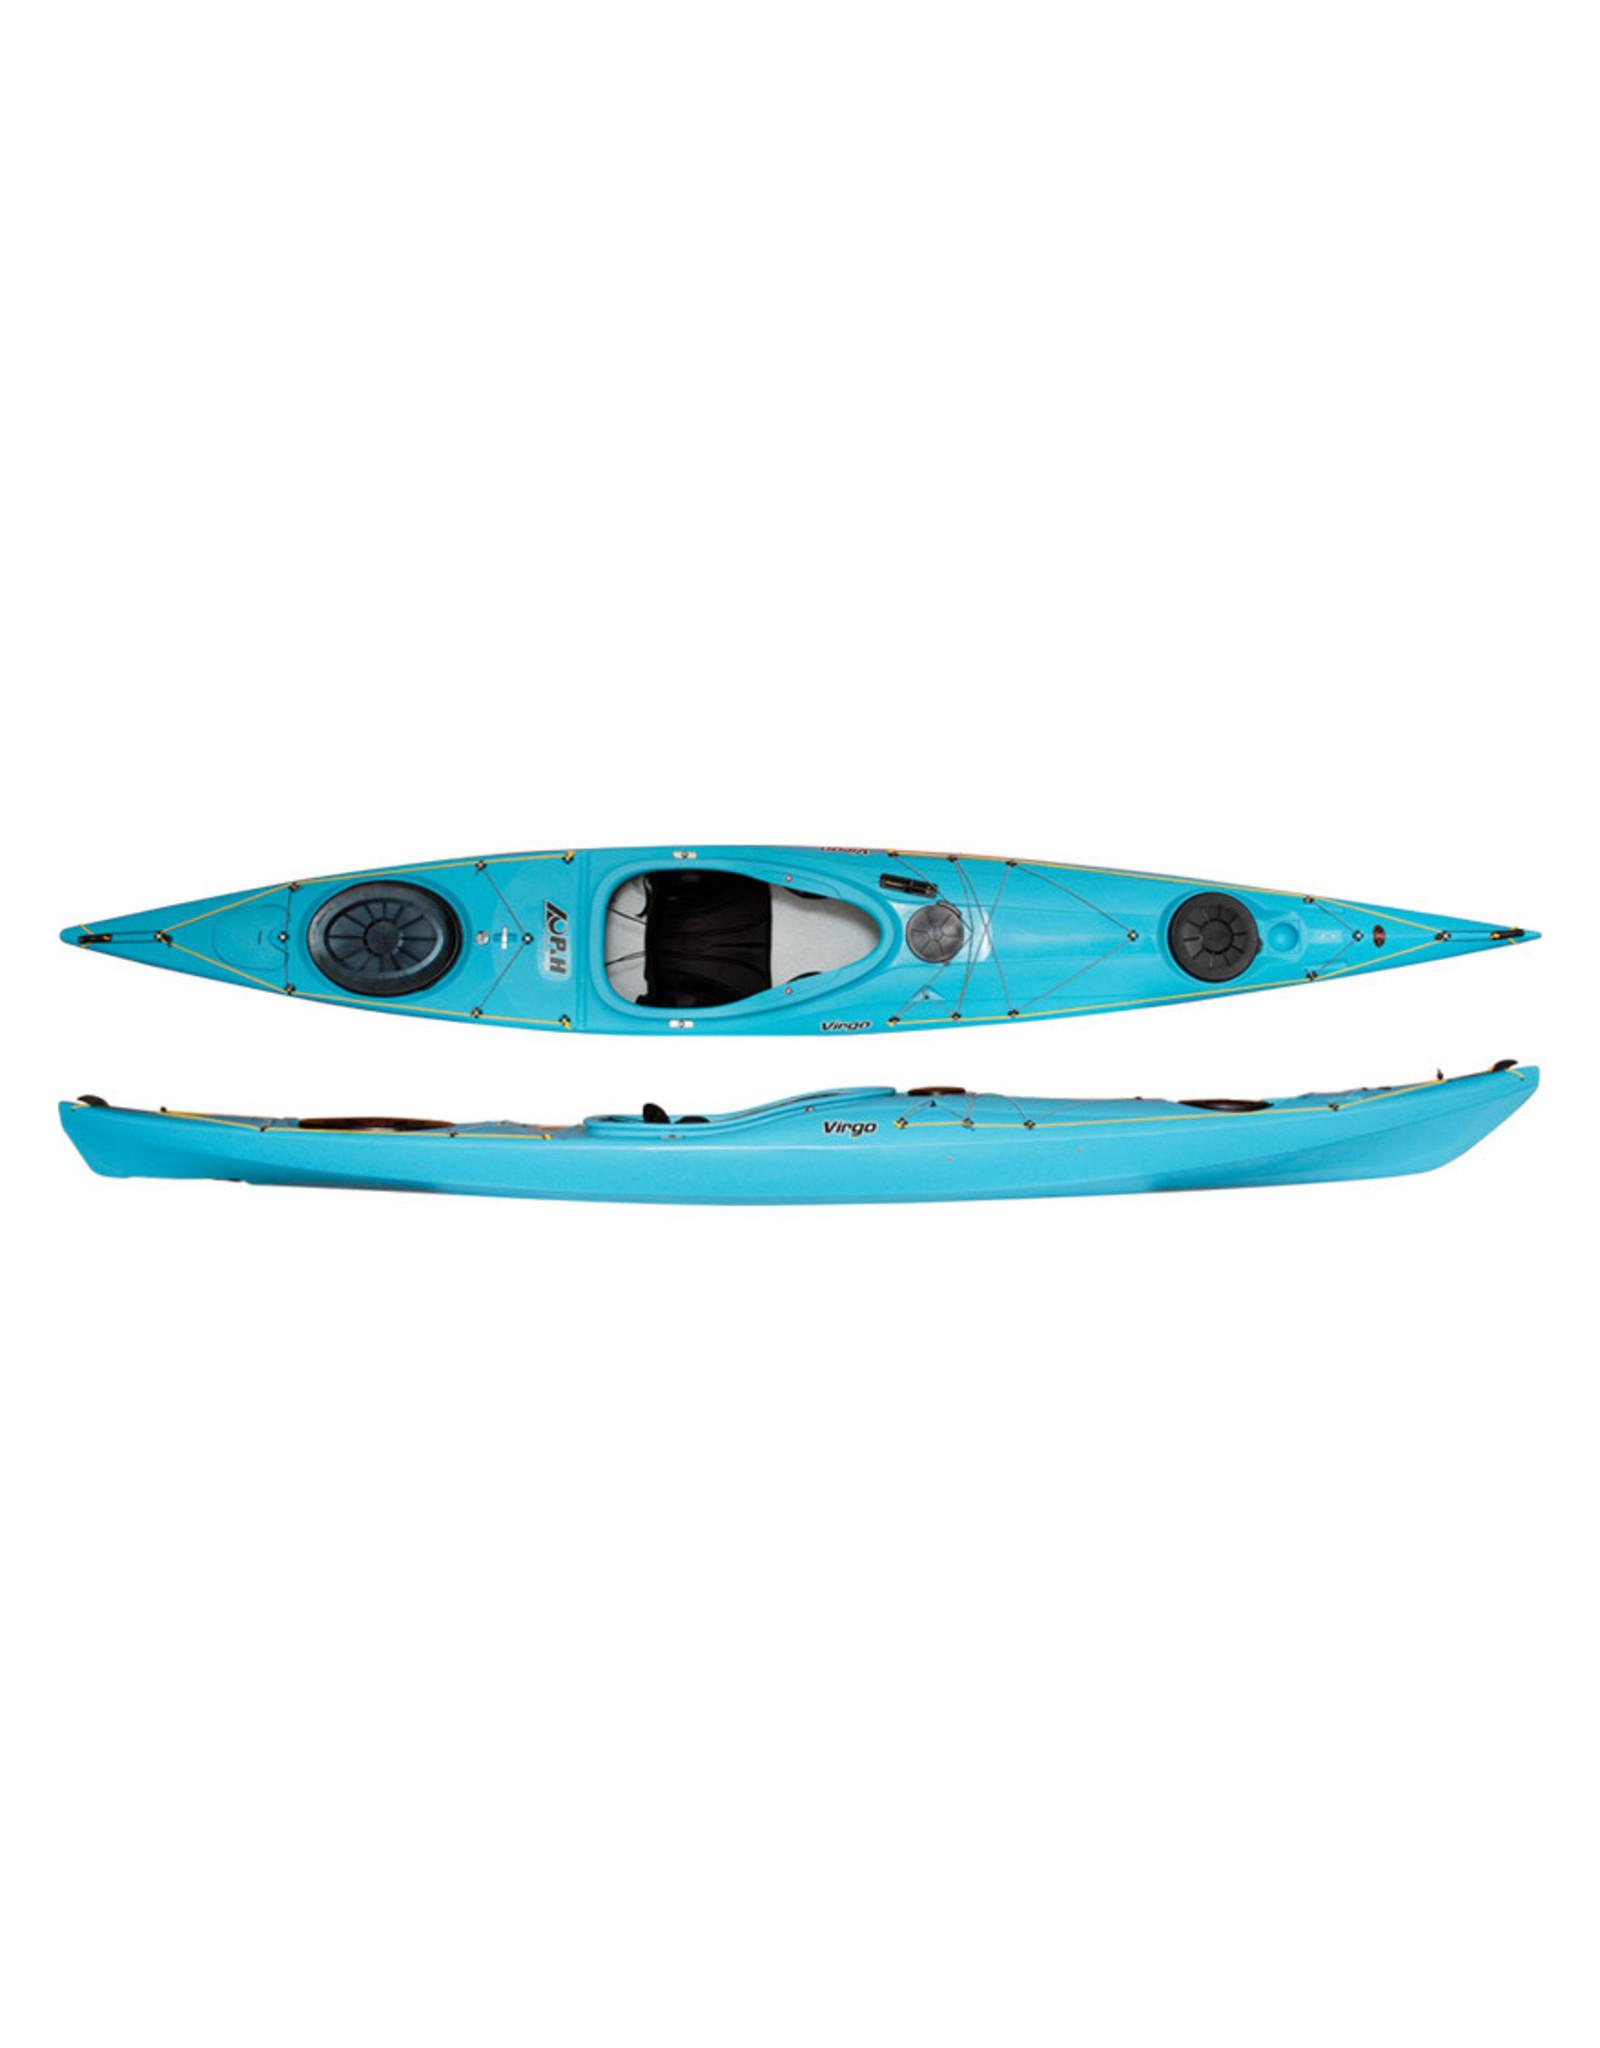 P&H Custom Sea Kayaks P&H kayak Virgo CoreLite X with skeg